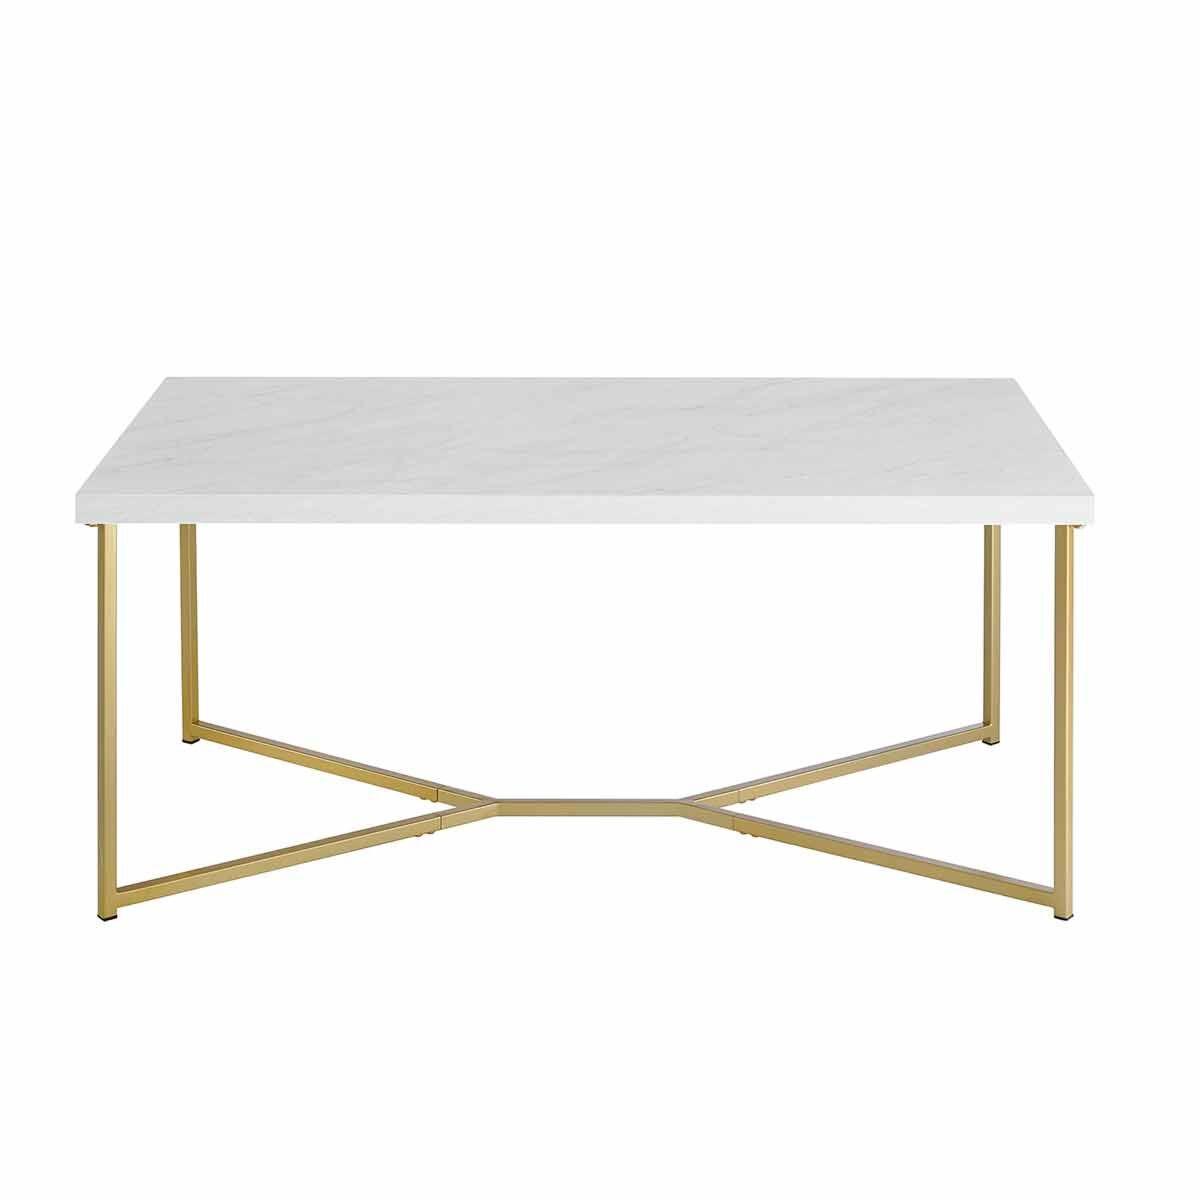 Lugo Mid Century Modern Rectangular Coffee Table Gold